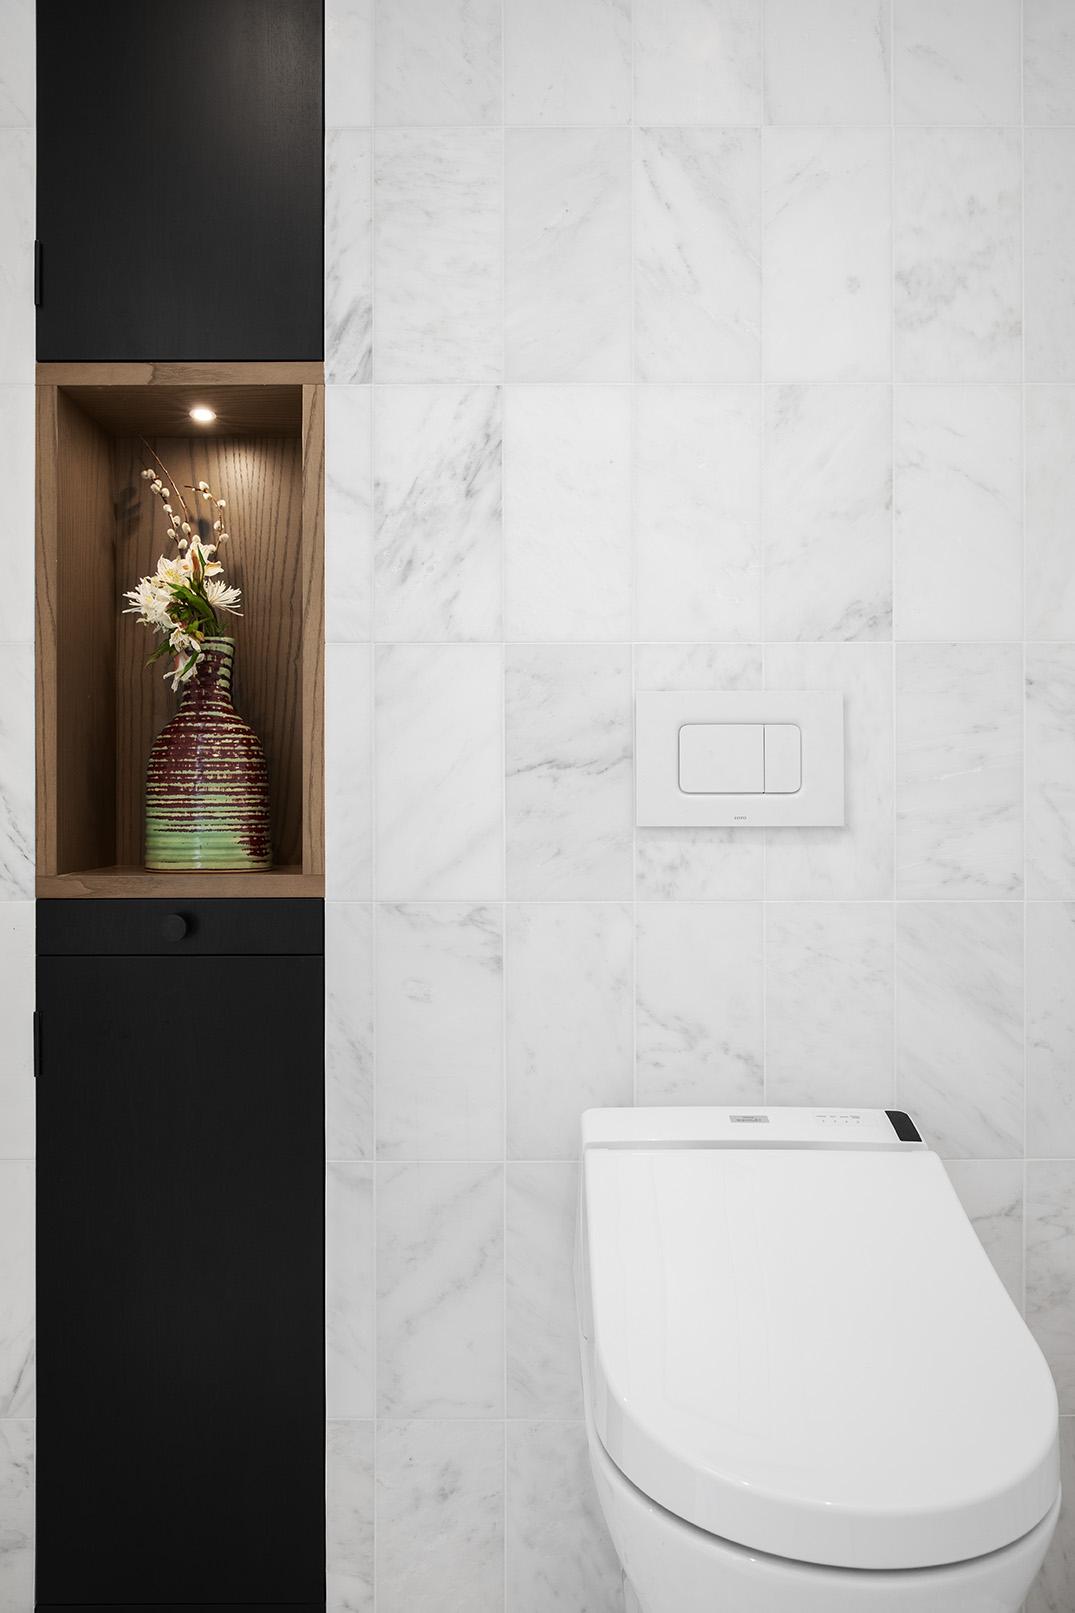 Glencoe II Project   Matte & Gloss Interiors   Interior Designer